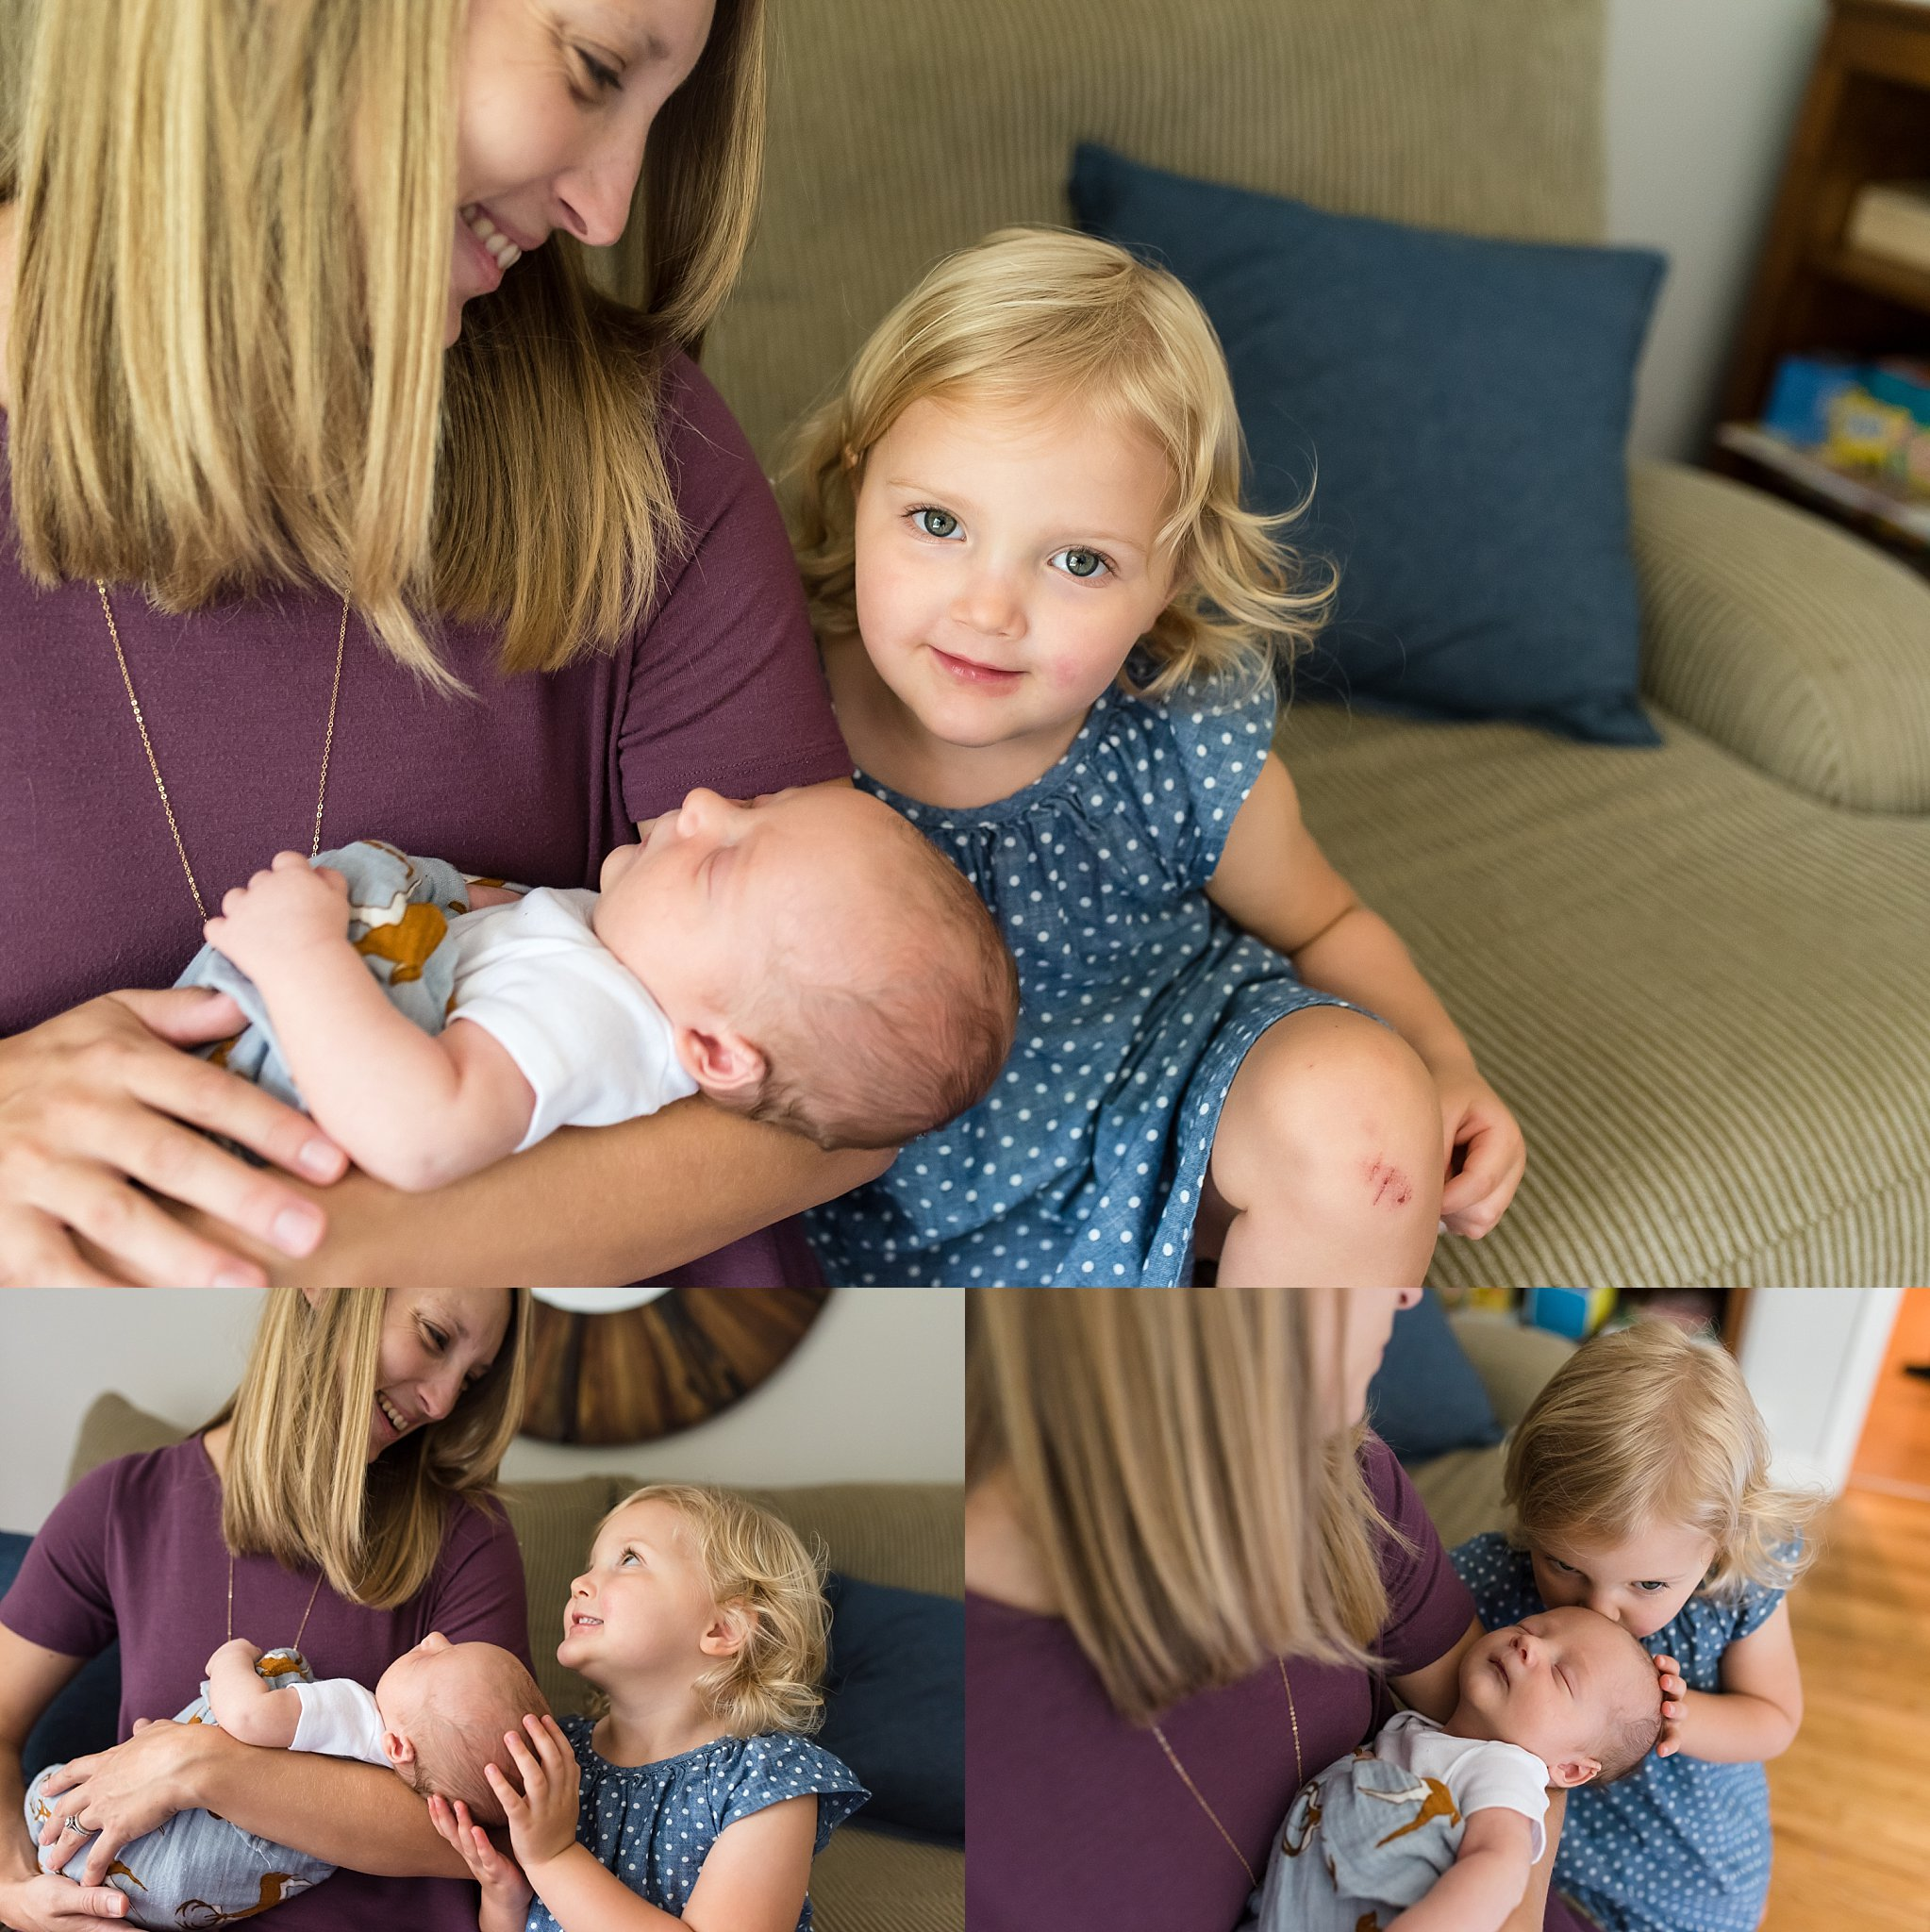 atlanta-family-photographers-decatur-newborn-photography (10).jpg